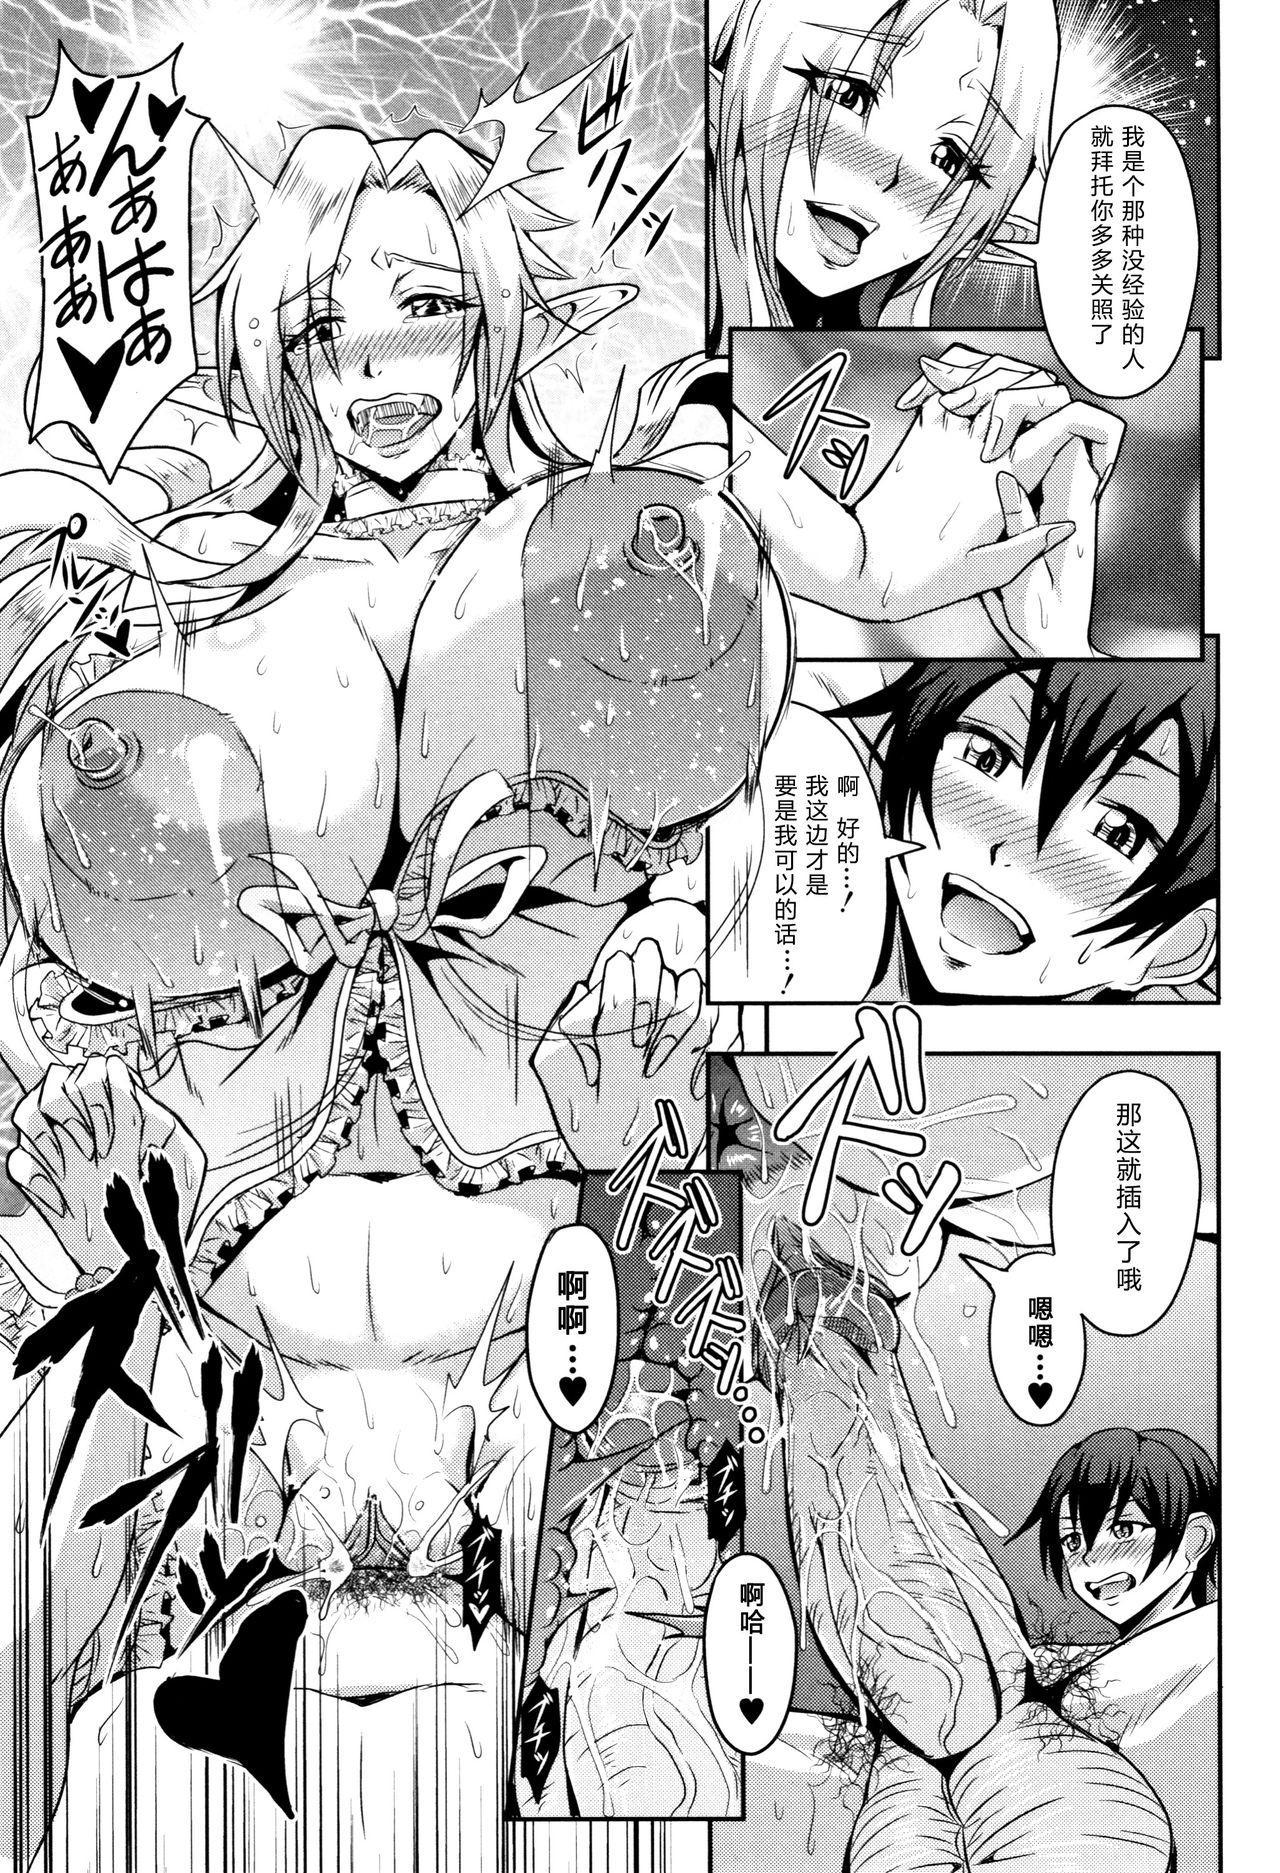 Elf Harem no Mori to Kozukuri Keiyaku | 妖精后宮生子契約 17